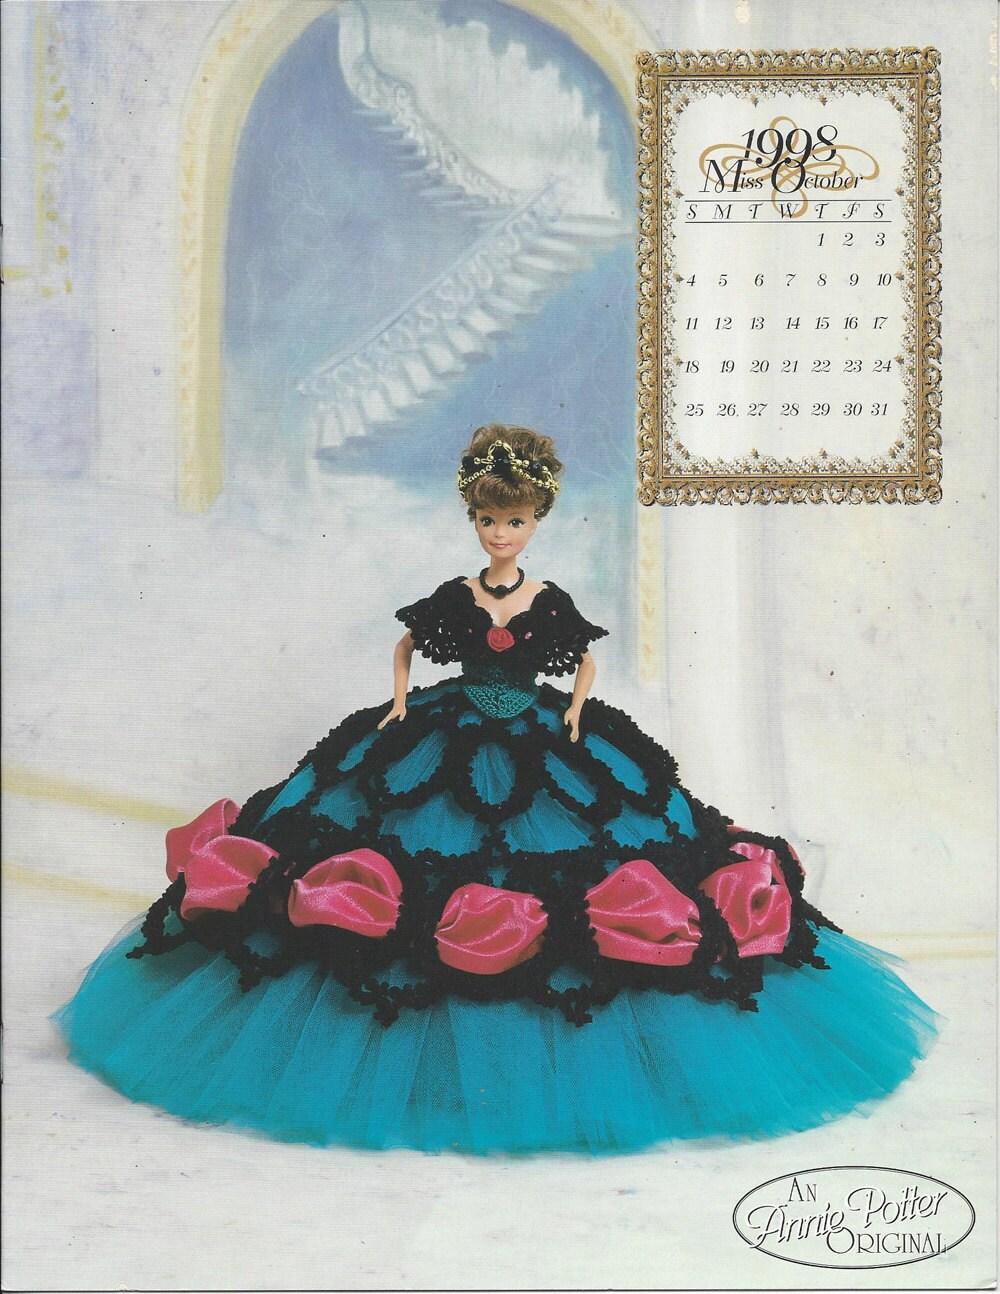 The Royal Ballgowns Pattern 1998 Master Crochet Series Miss October